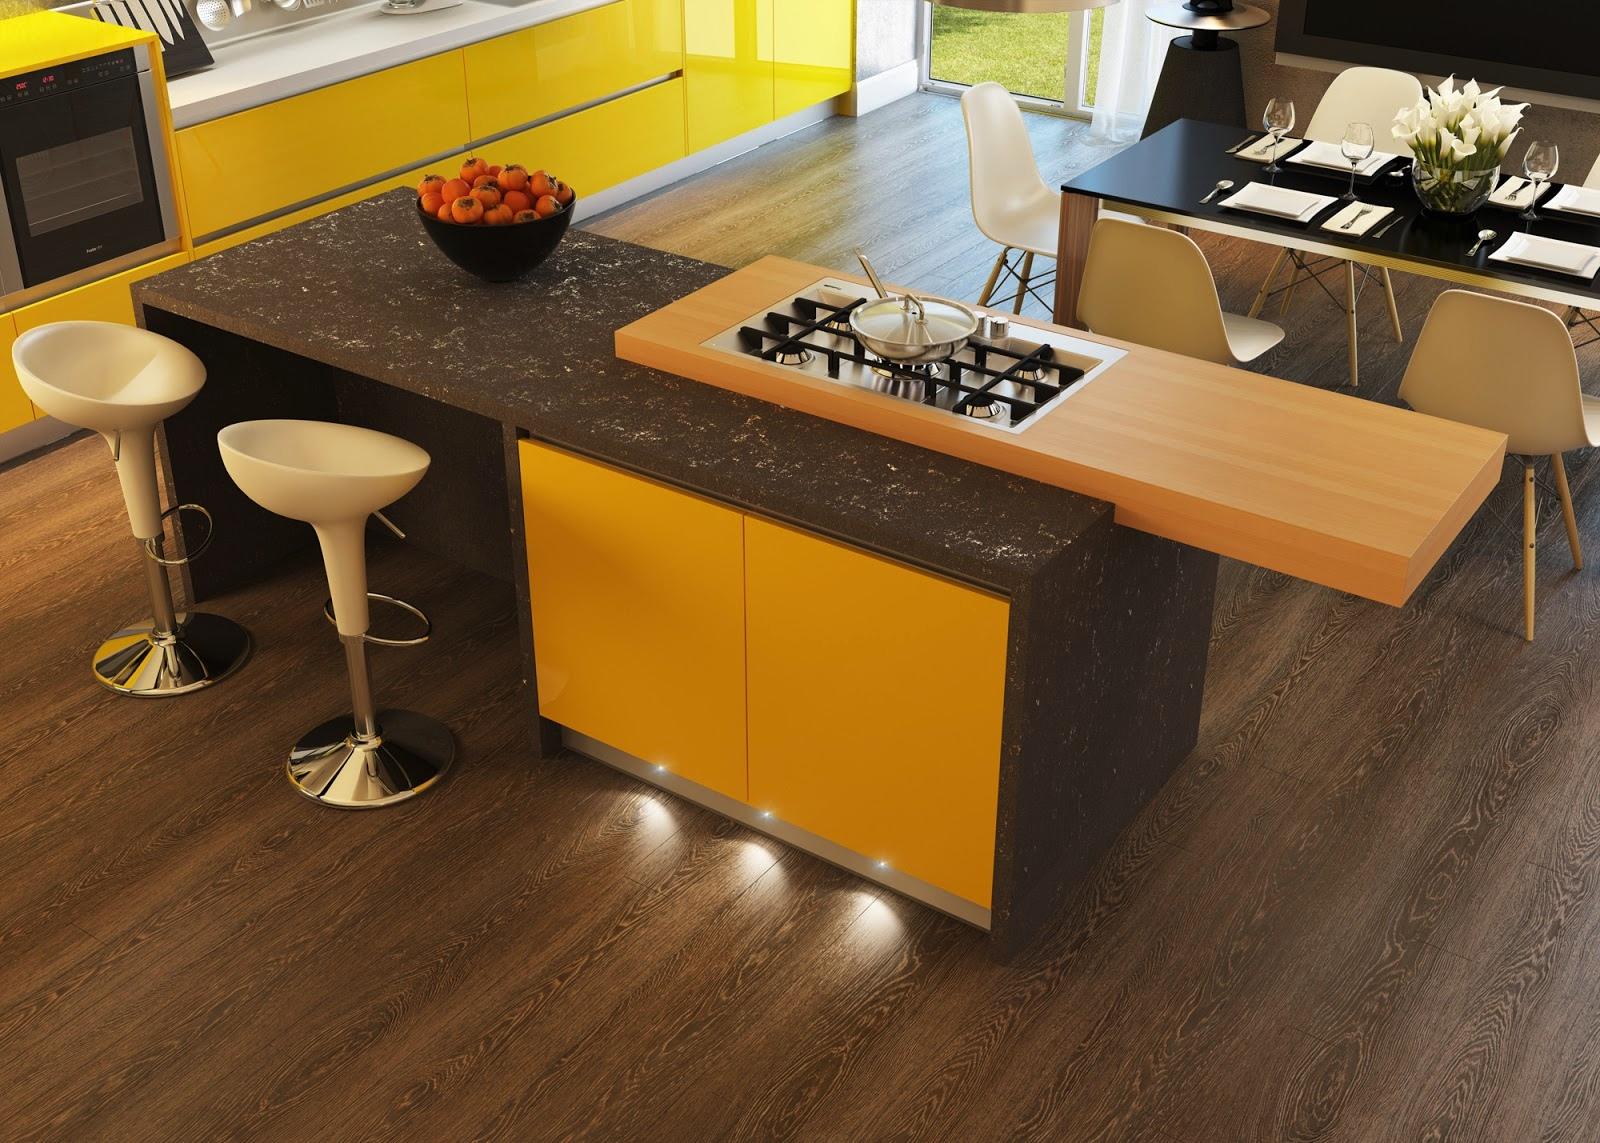 Kitchen Island With Stove Interior Design Ideas